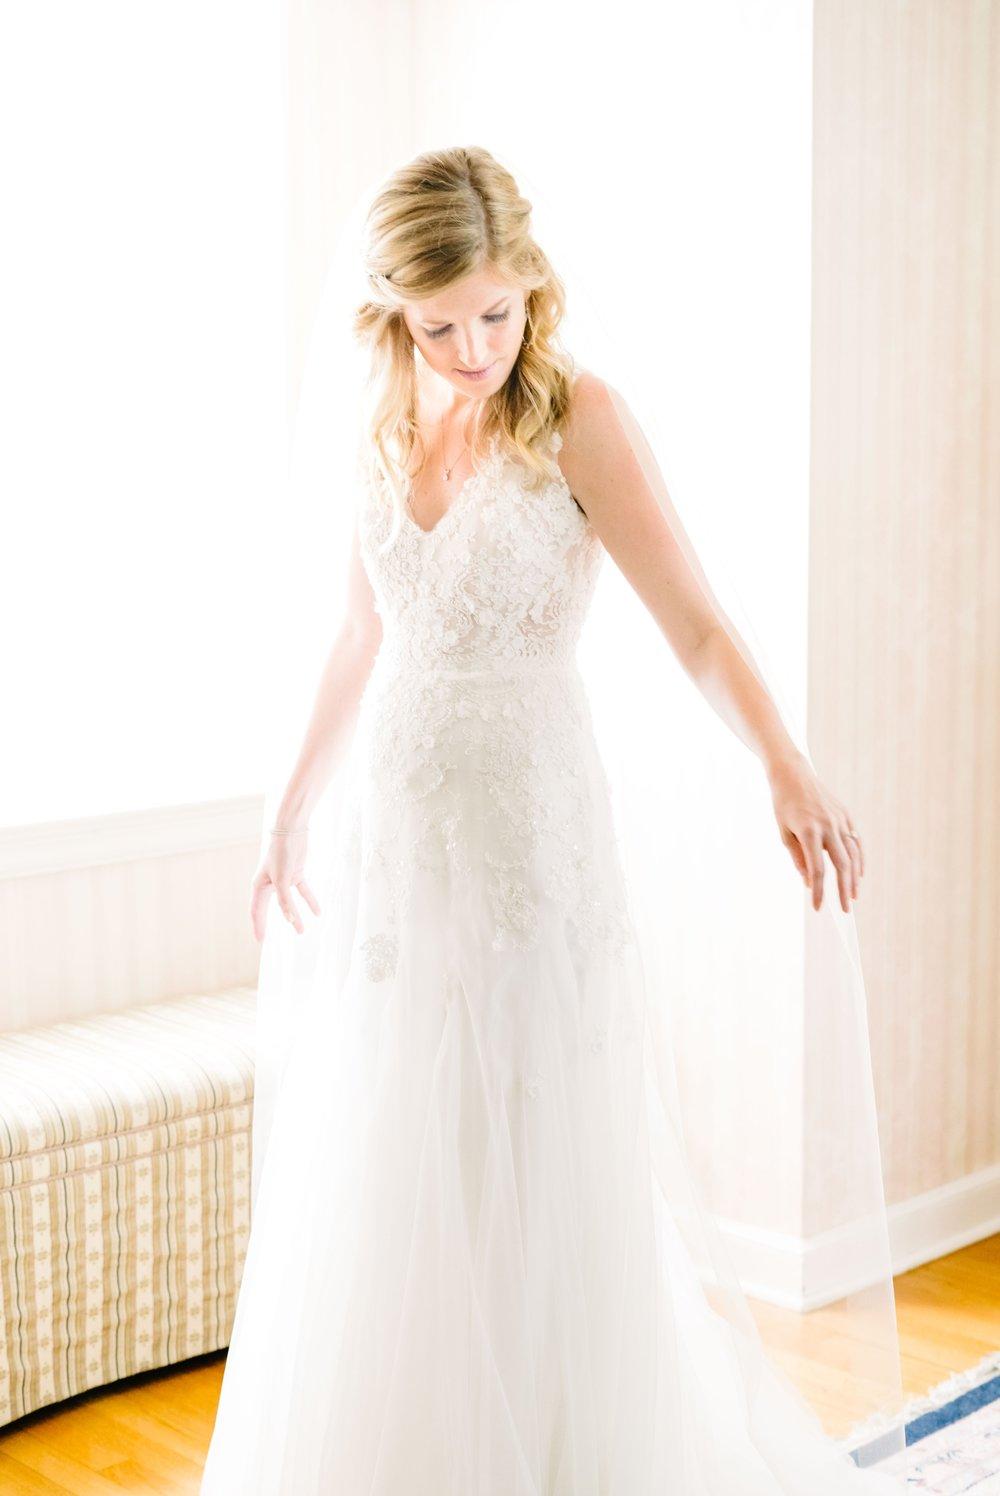 danada-house-fine-art-wedding-photography-sandberg17